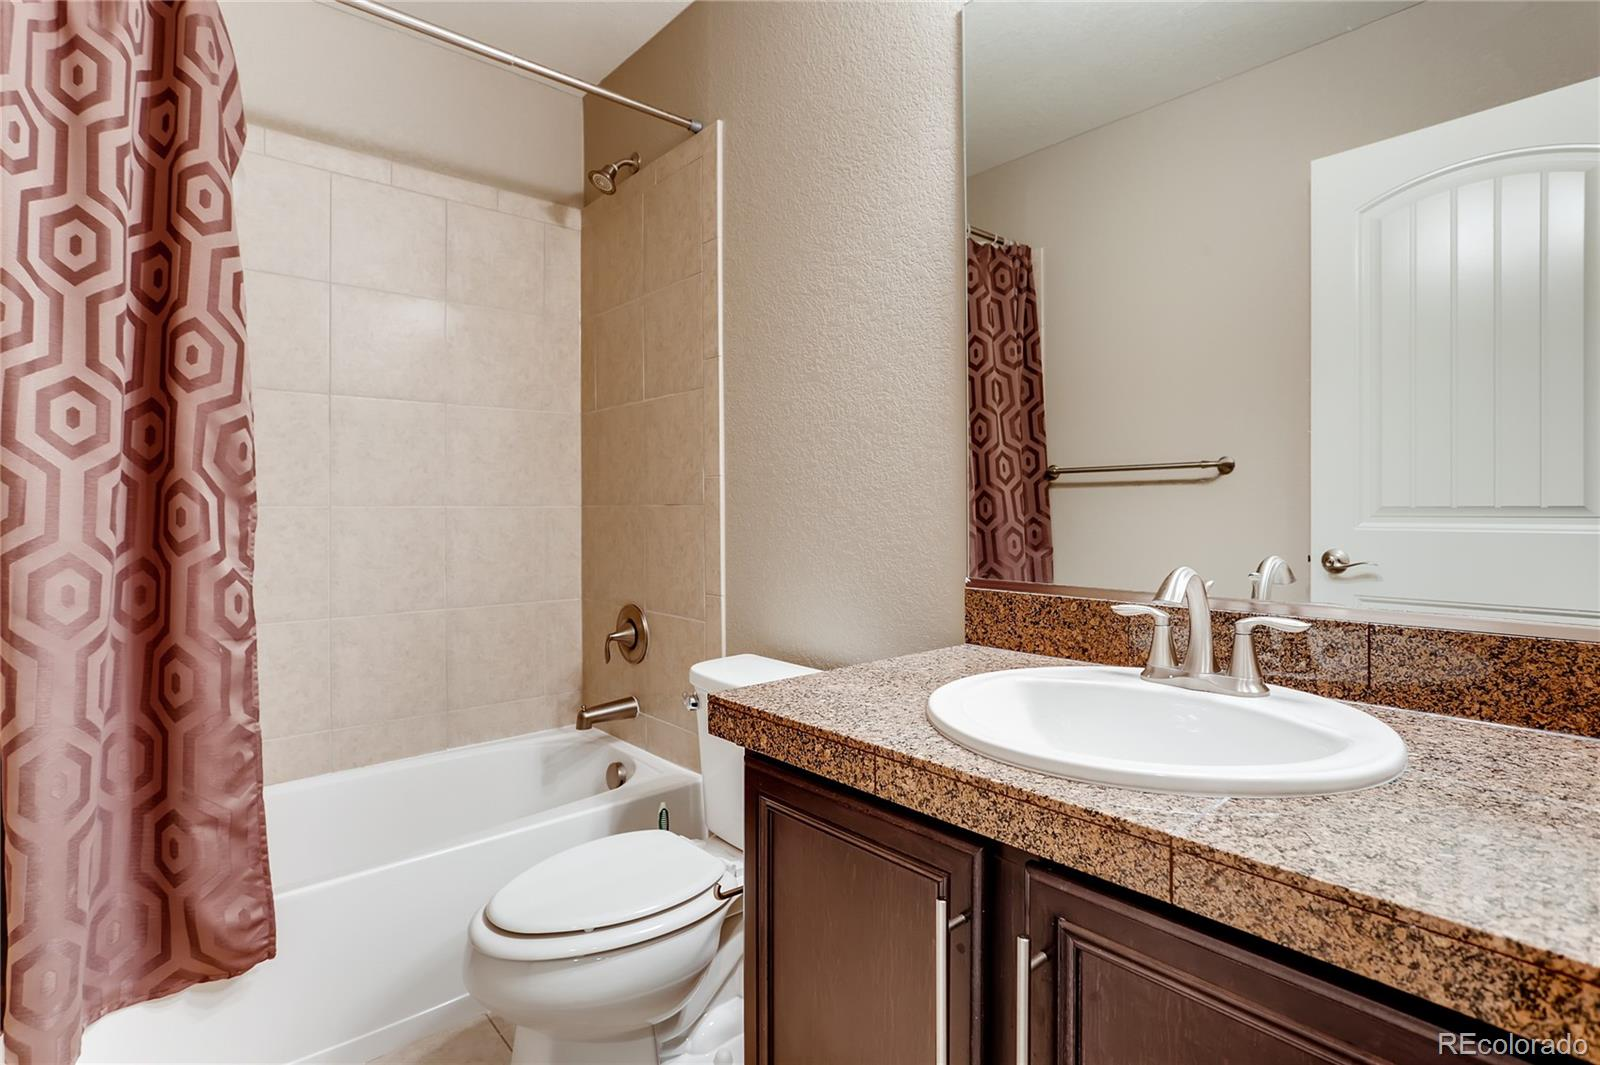 MLS# 6064217 - 21 - 19406 E 62nd Place, Aurora, CO 80019